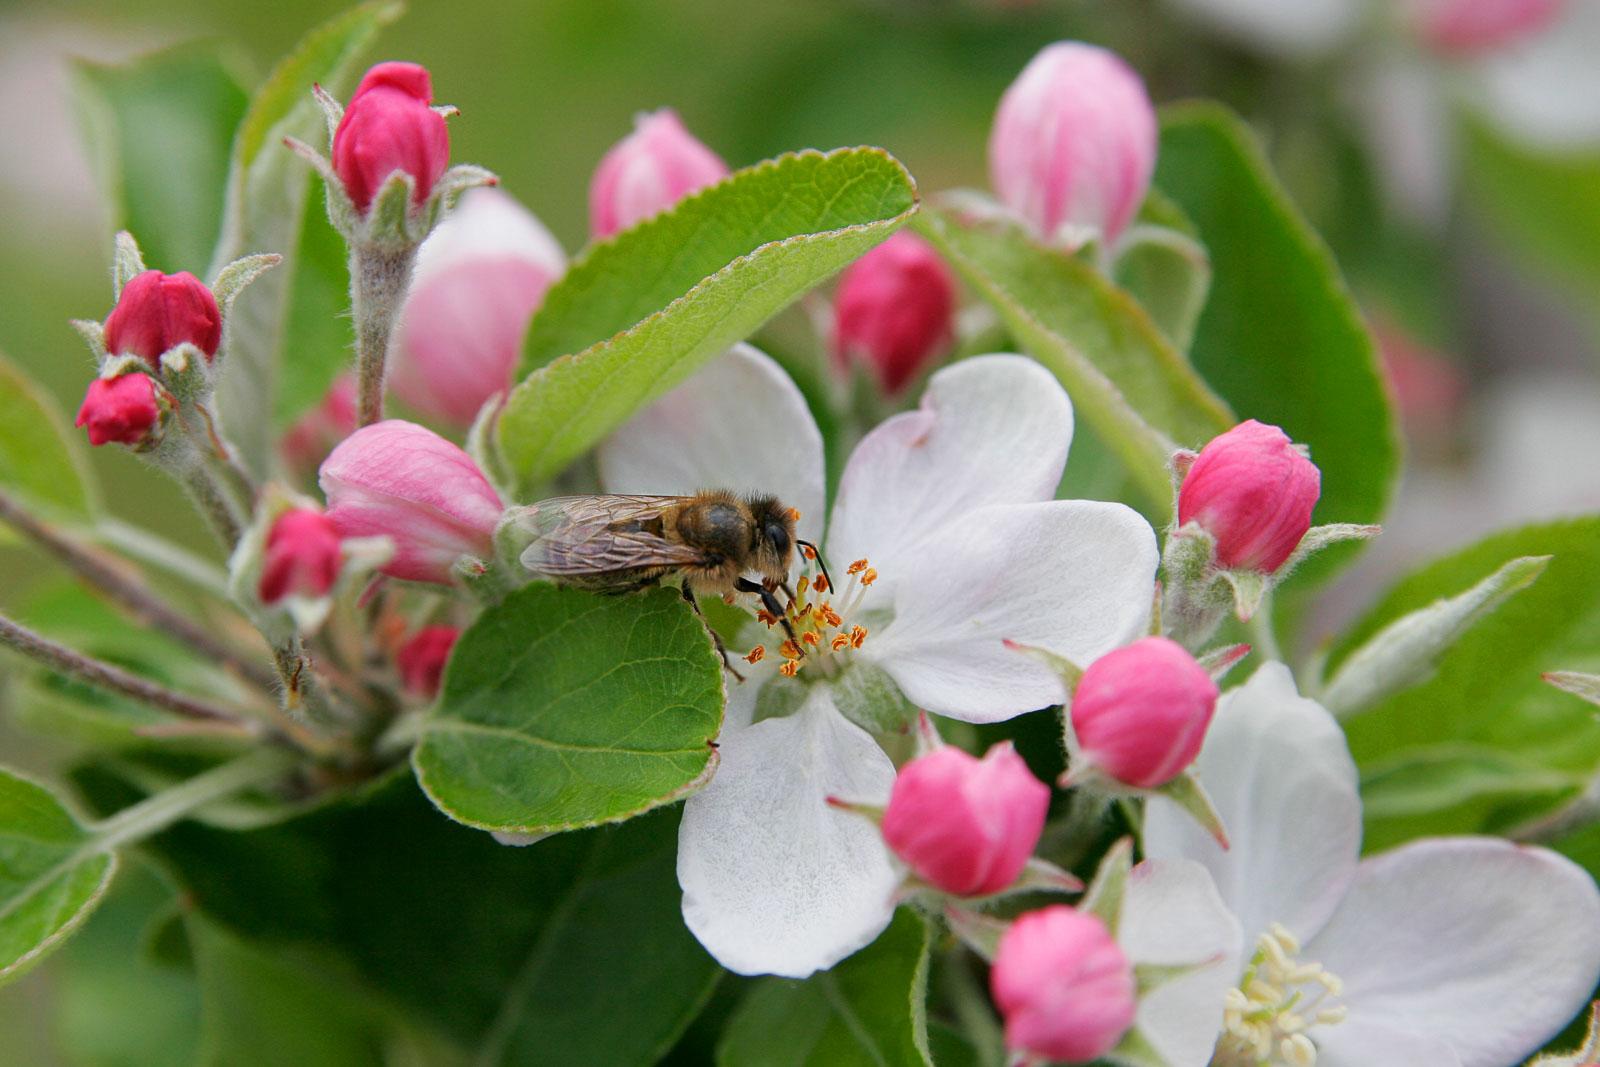 Wwe Wrestlers Profile Arkansas State Flower Apple Blossom Gallery